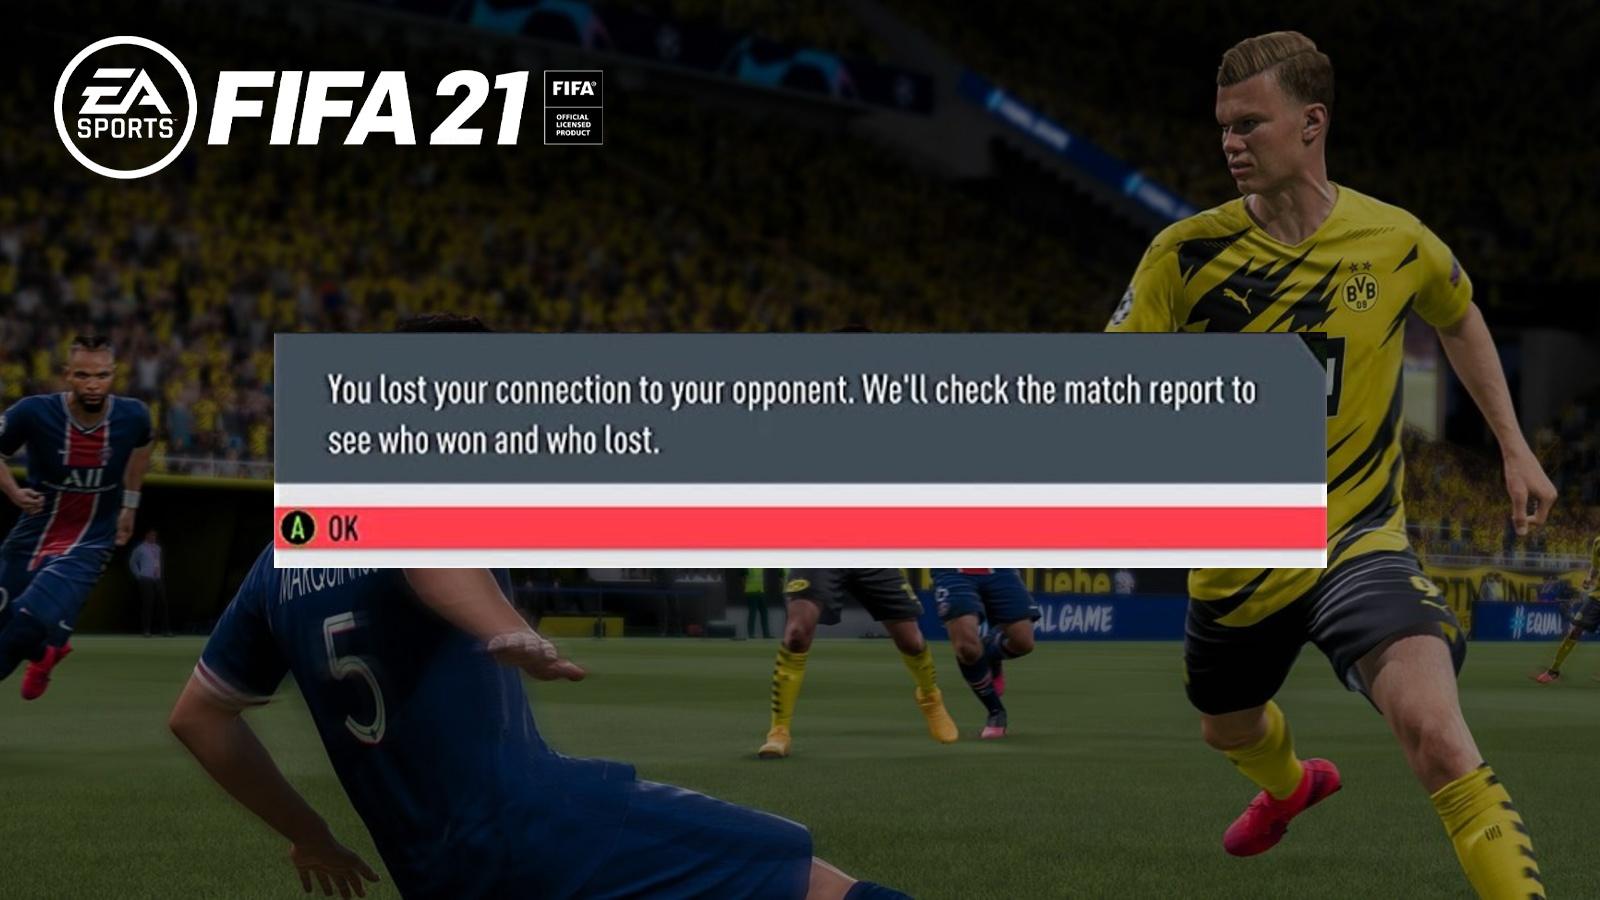 Erling Haaland FIFA 21 rage quit